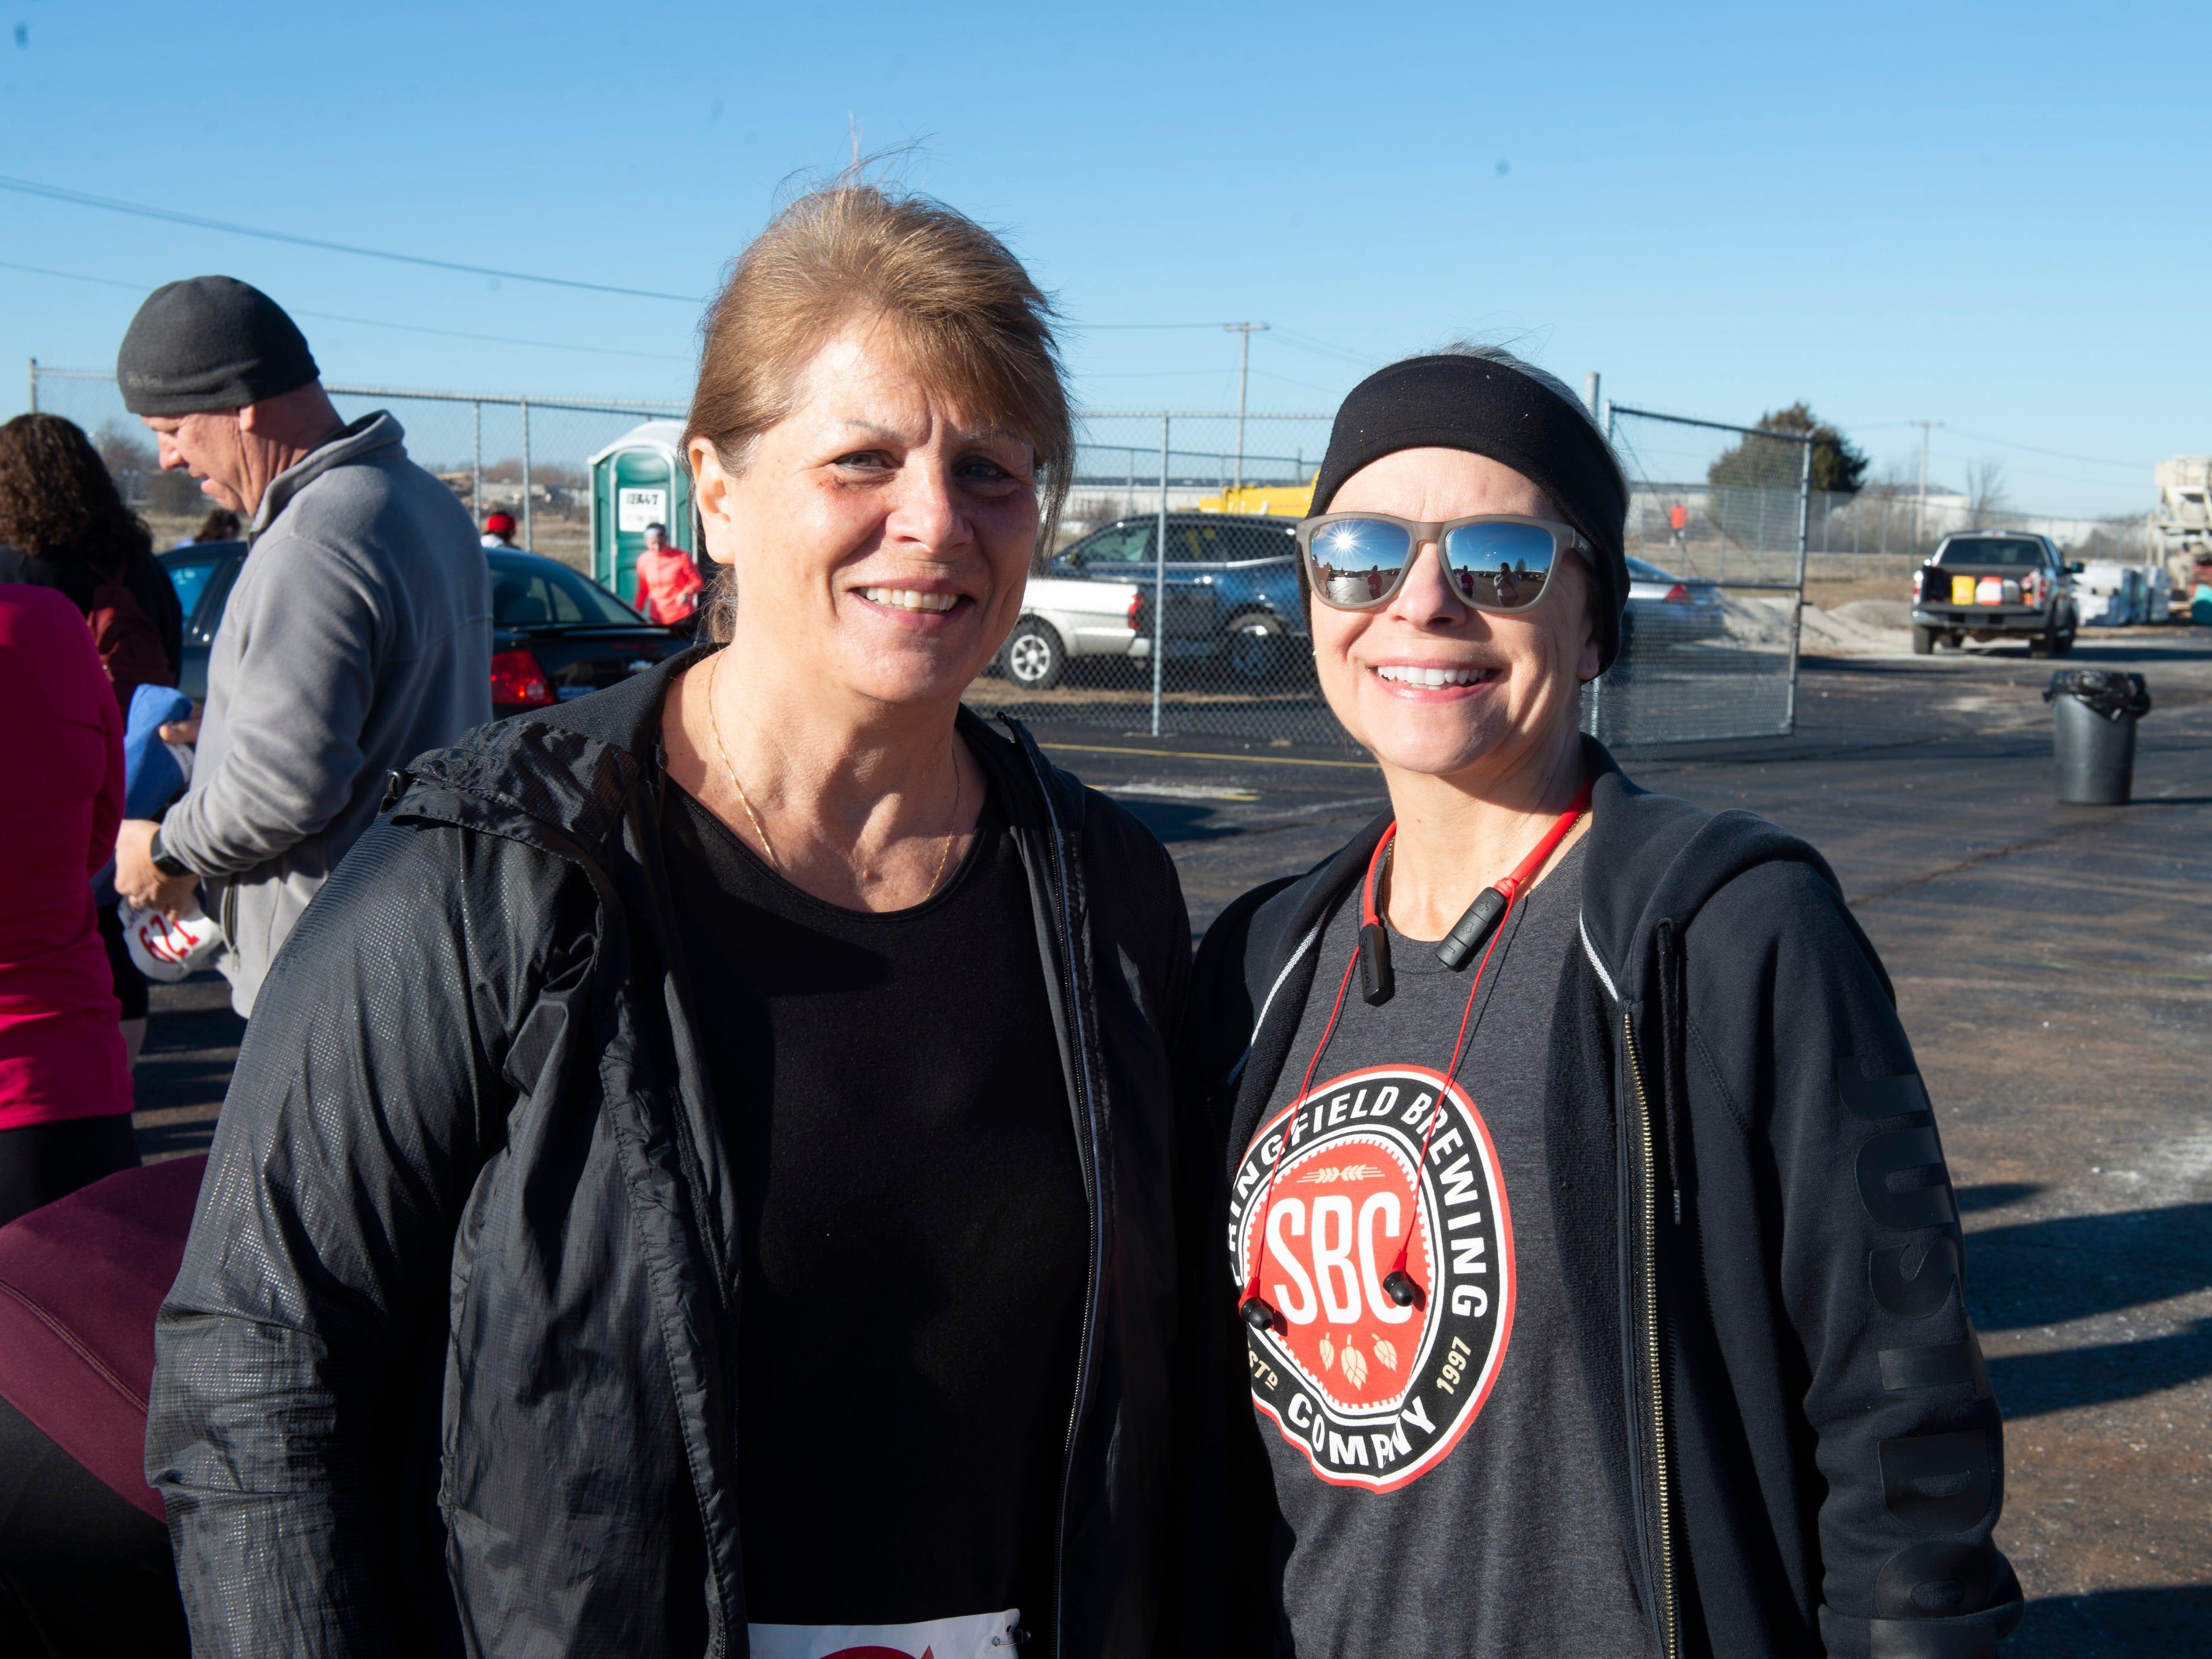 Paula Thompson and Glenda Gricest